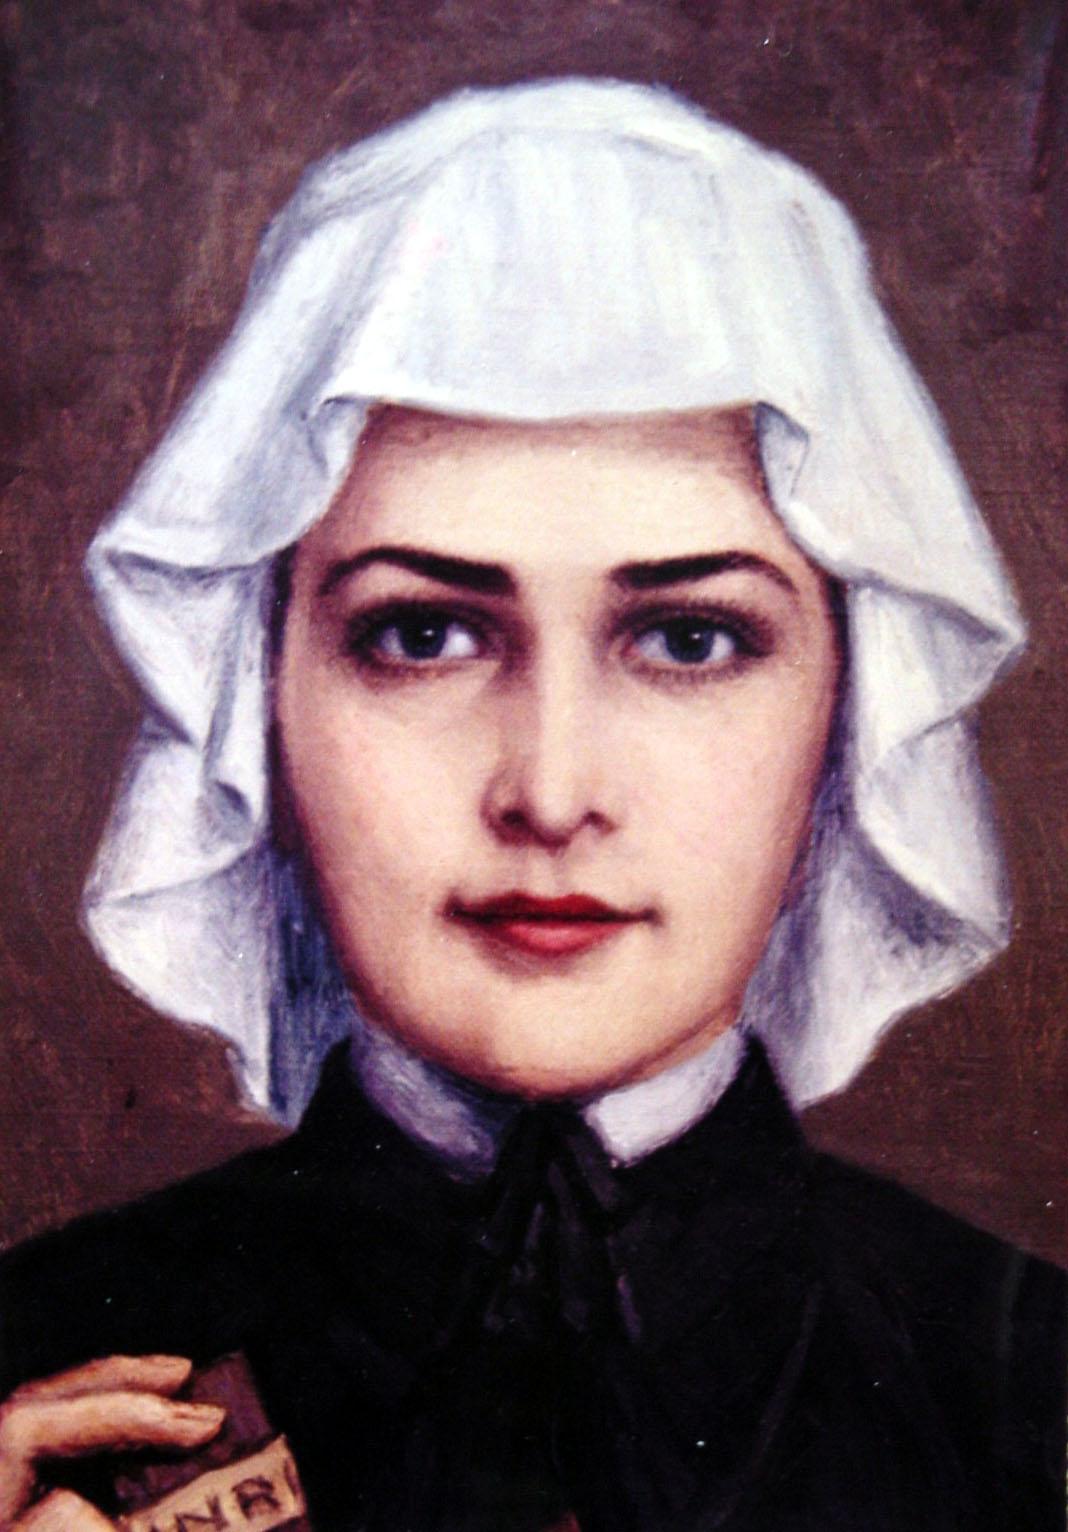 Prelatura de Caravelí: Festividad de Santa Isabel Ana Bayley Seton